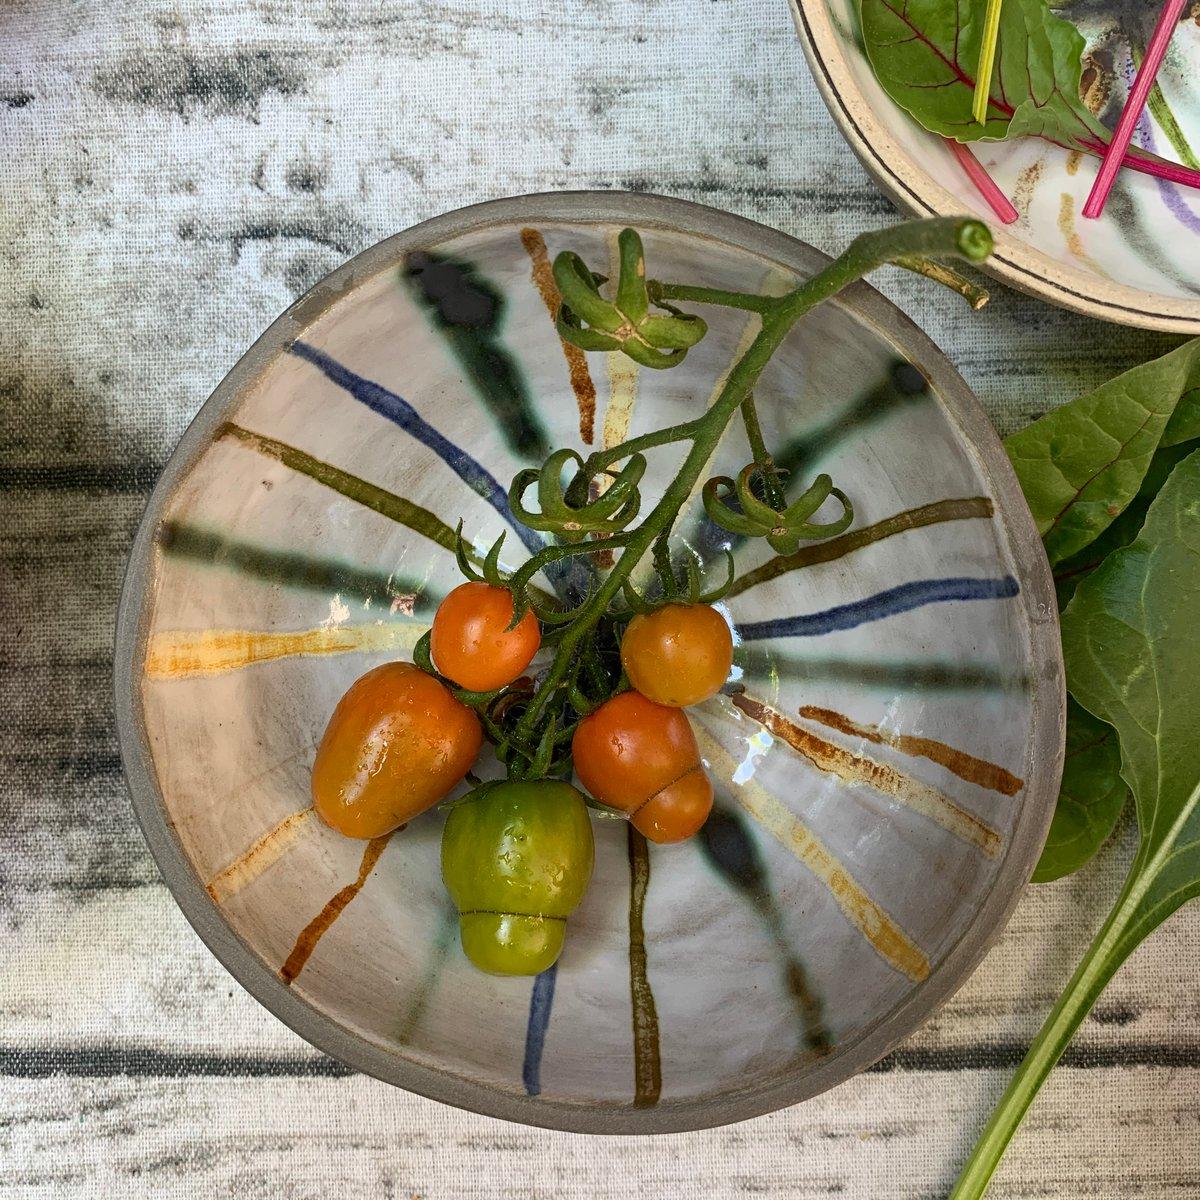 Small bowl, rainbow radiance, anthracite